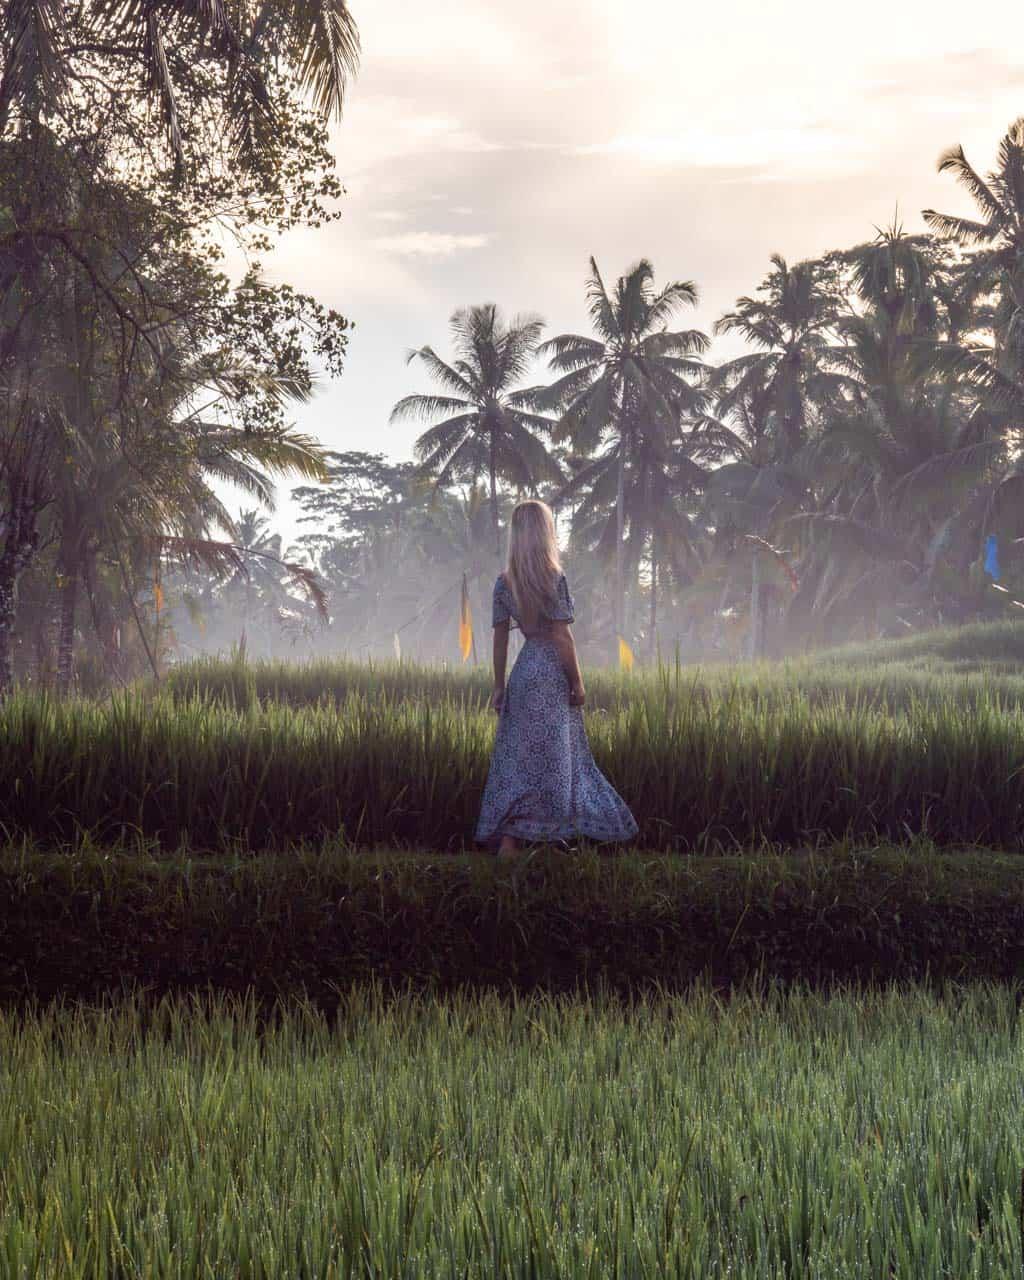 tegalalang-ricefield-bali-instagram-spot